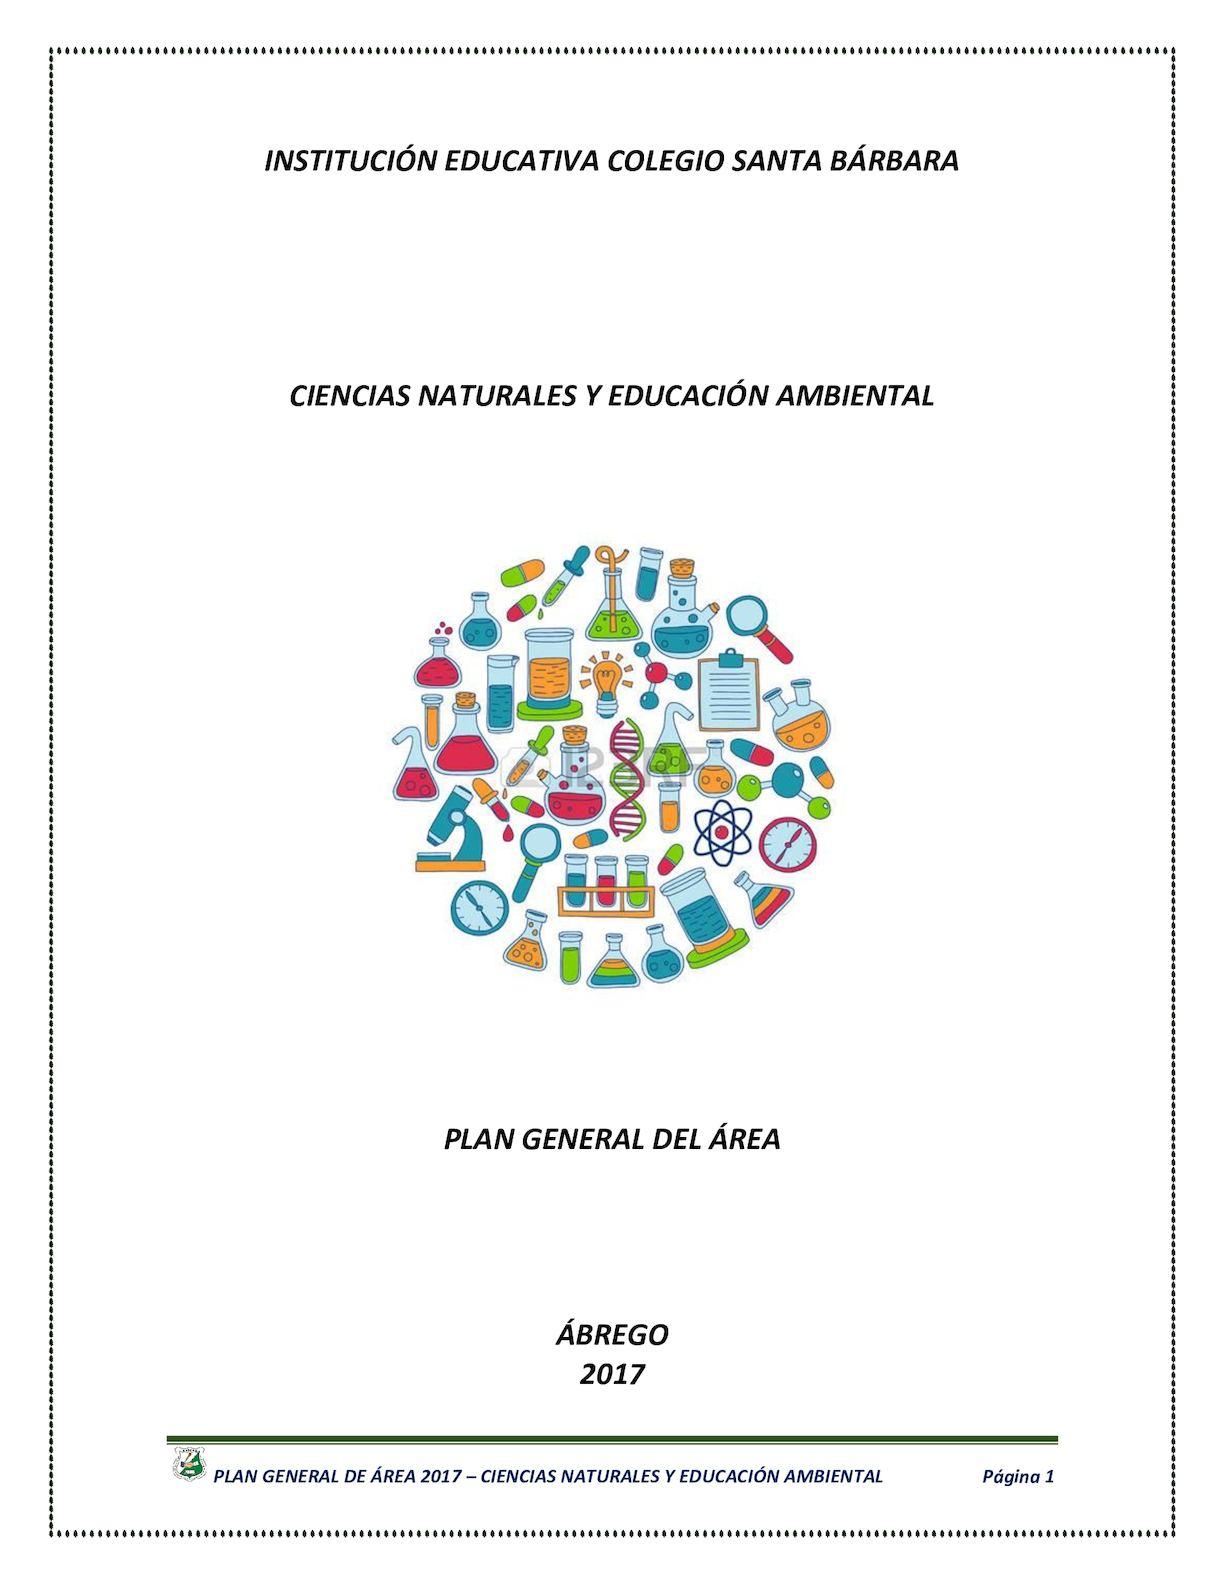 Calaméo - PLAN GENERAL CIENCIAS NATURALES 2017